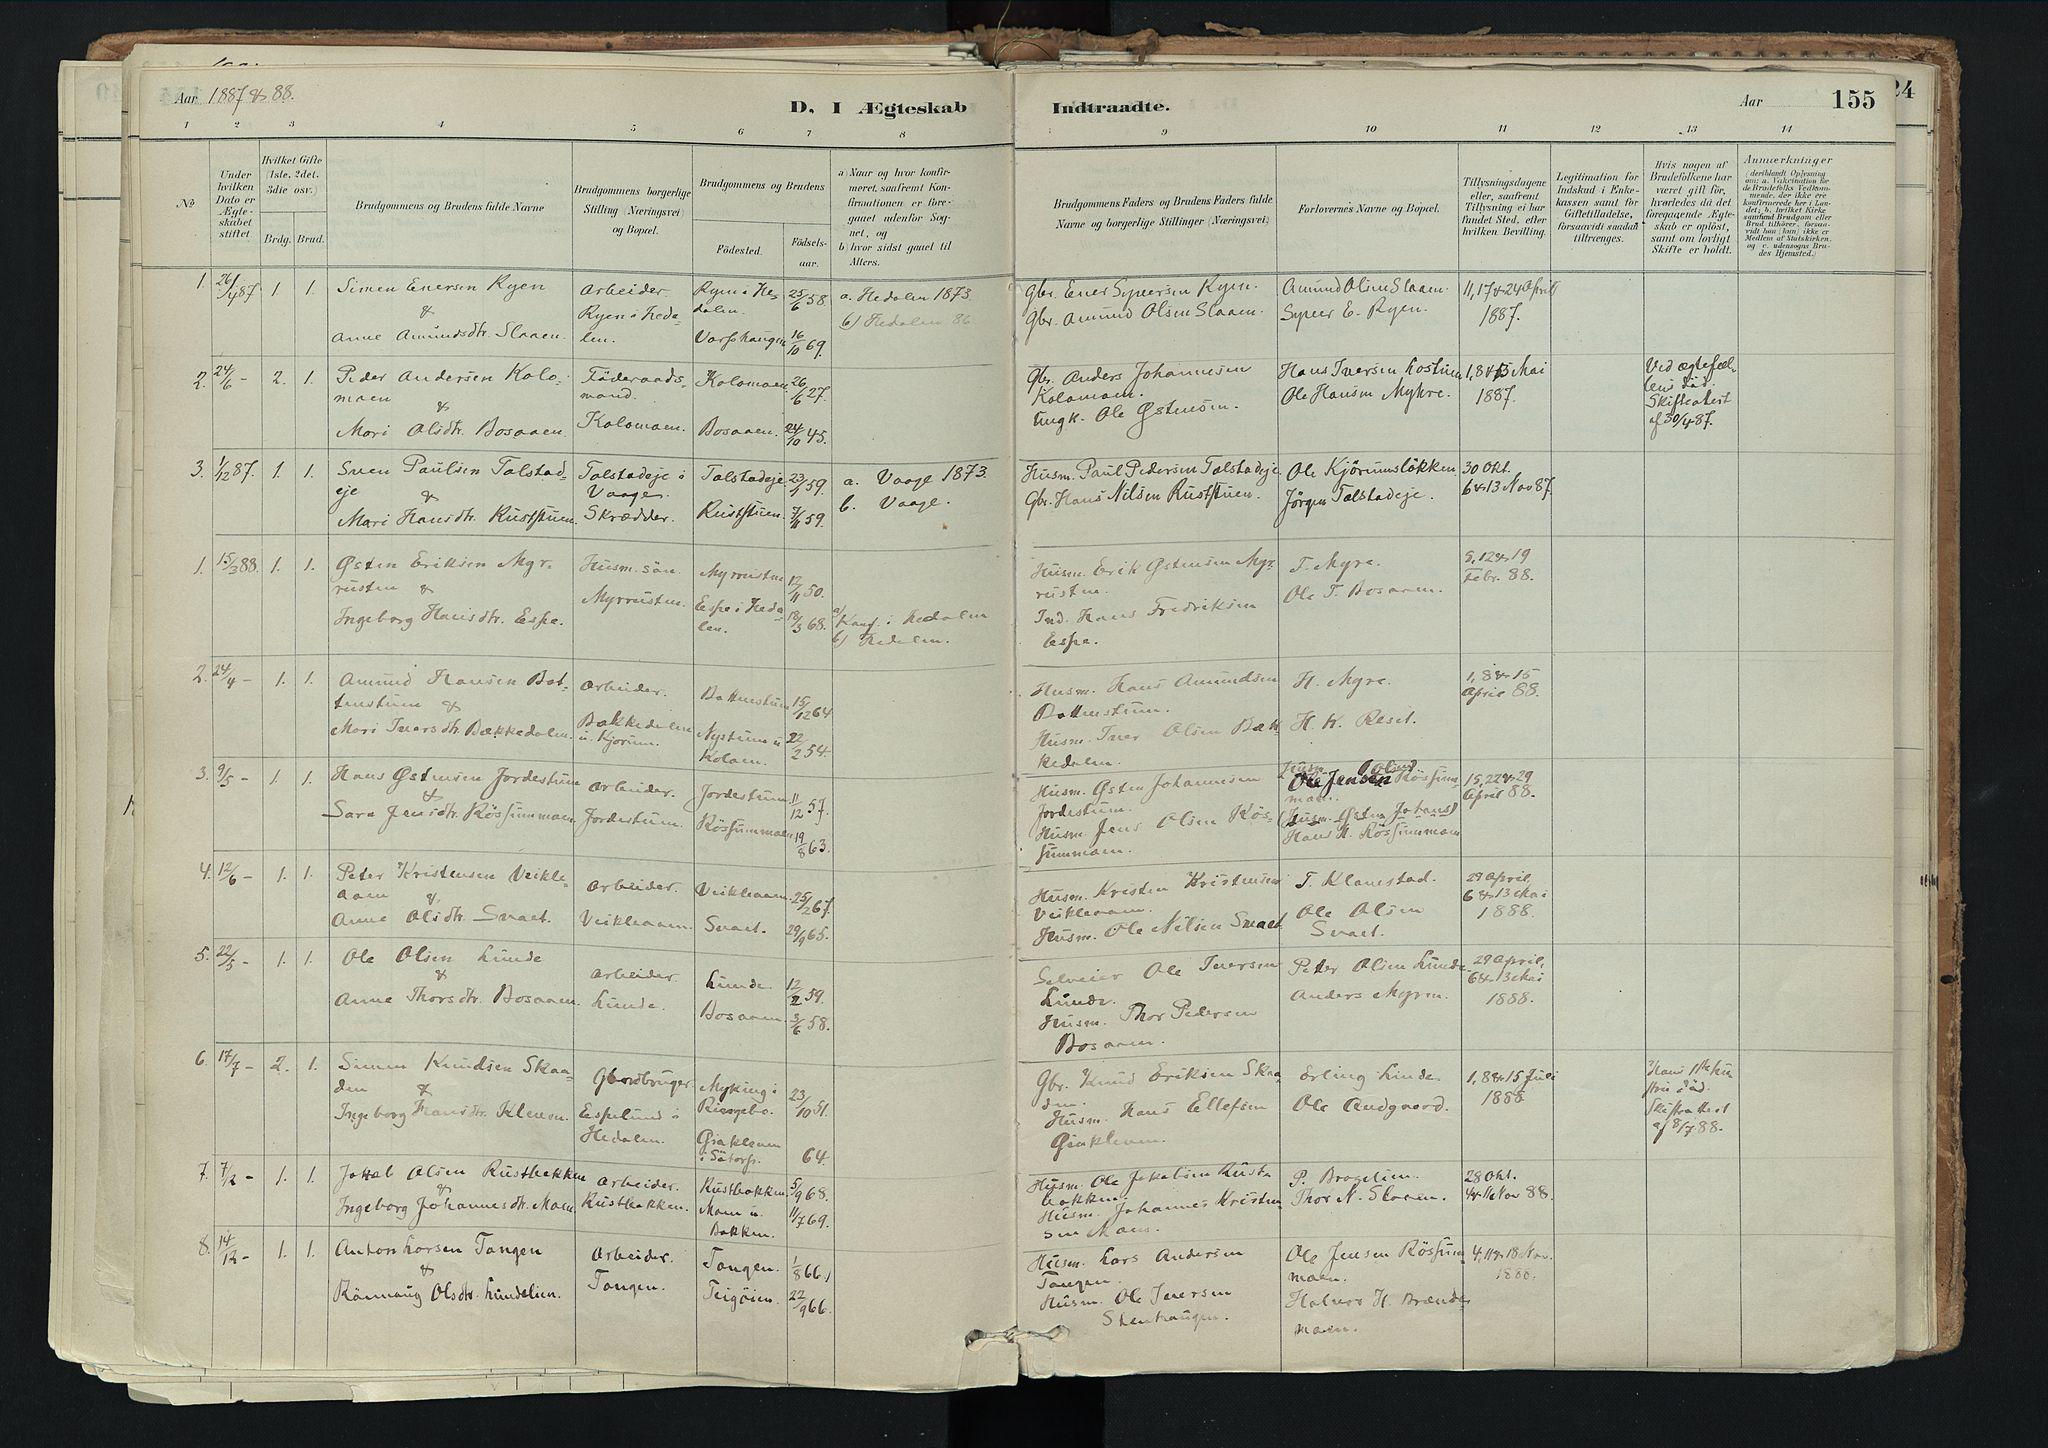 SAH, Nord-Fron prestekontor, Ministerialbok nr. 3, 1884-1914, s. 155